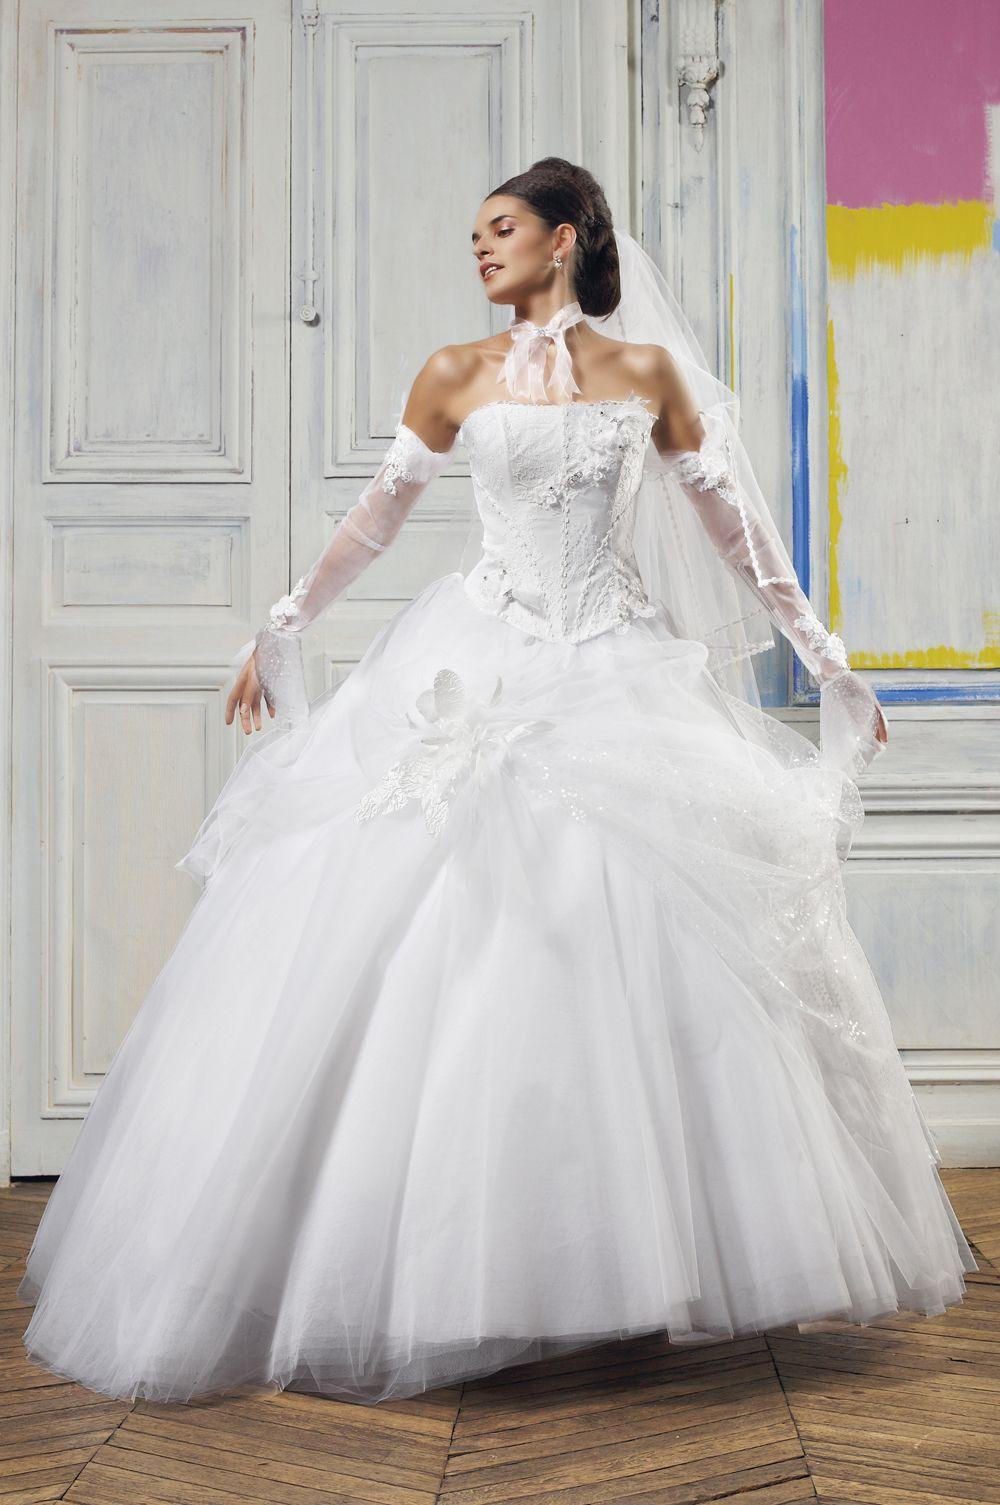 Corset And Skirt Wedding Dress Corset Wedding Dress Wedding